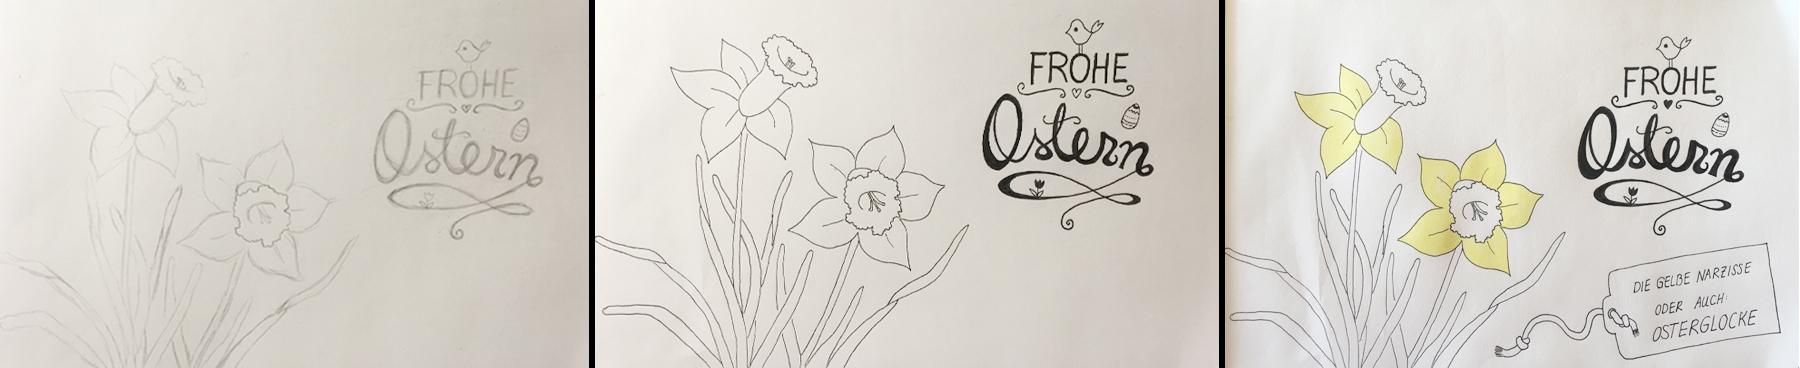 Osterglocke-Illustration-wip